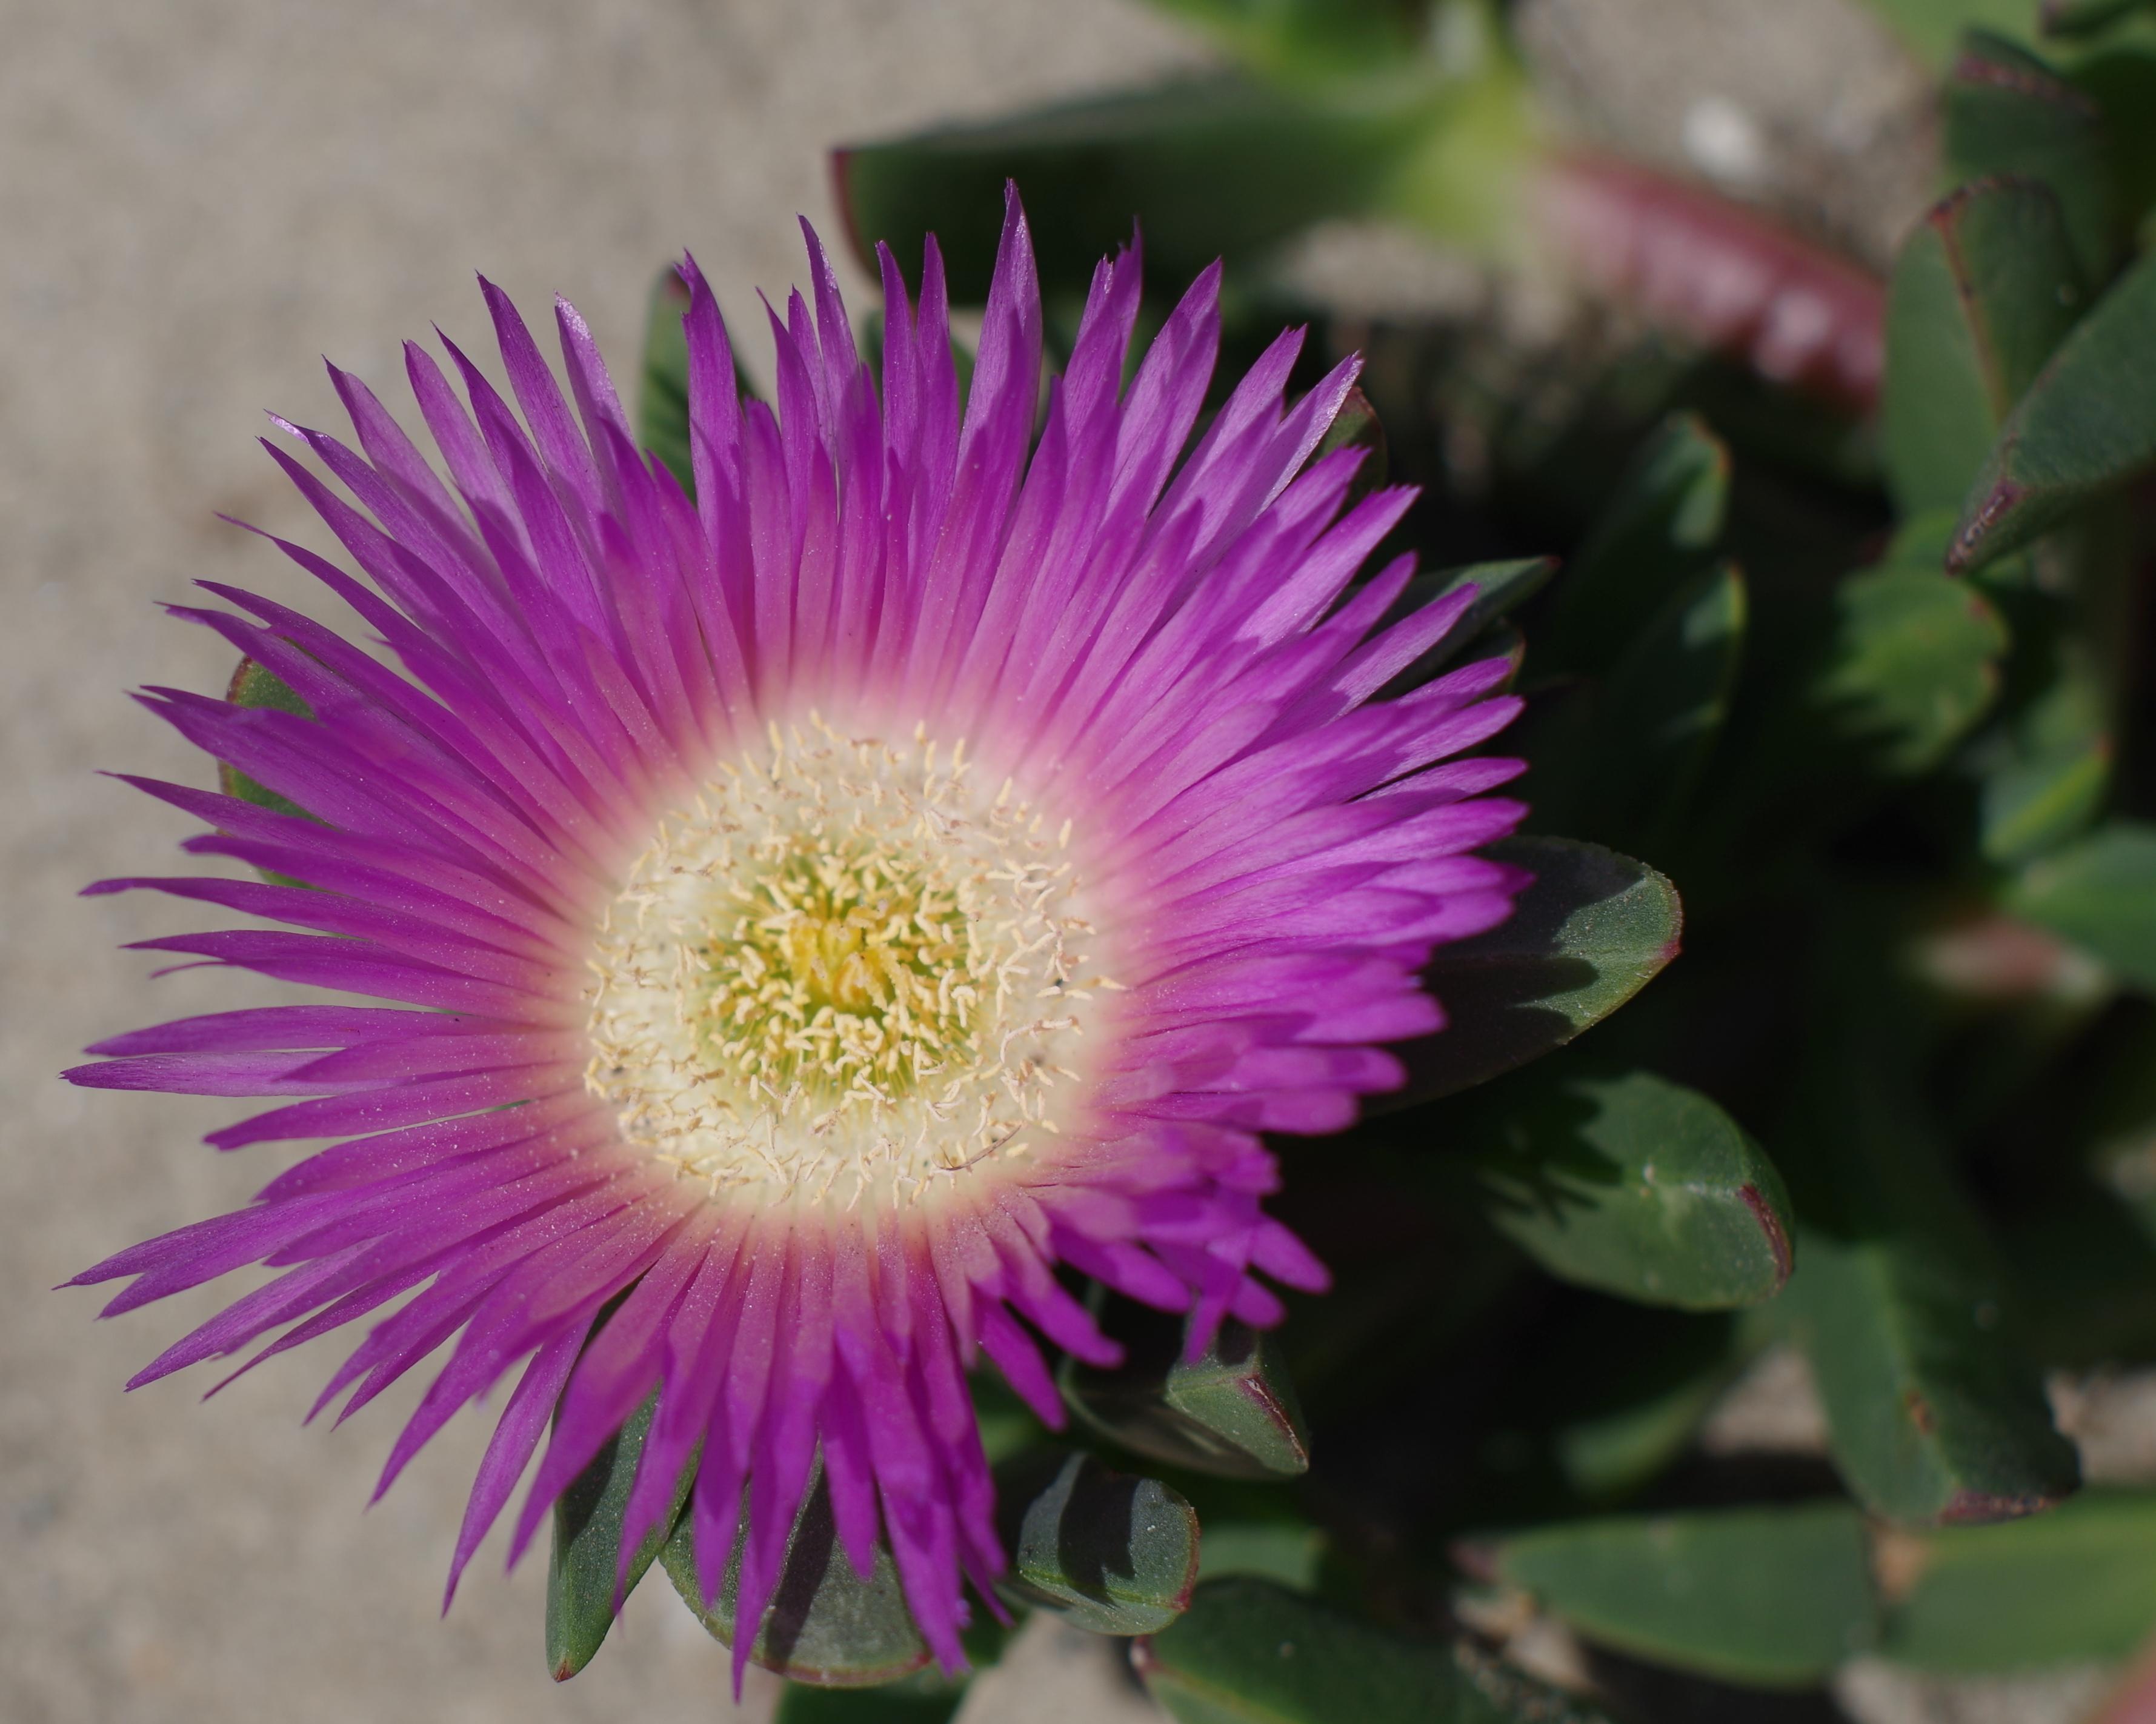 Pretty Pink Flowers Enjoy My Photography Jayesh Patel